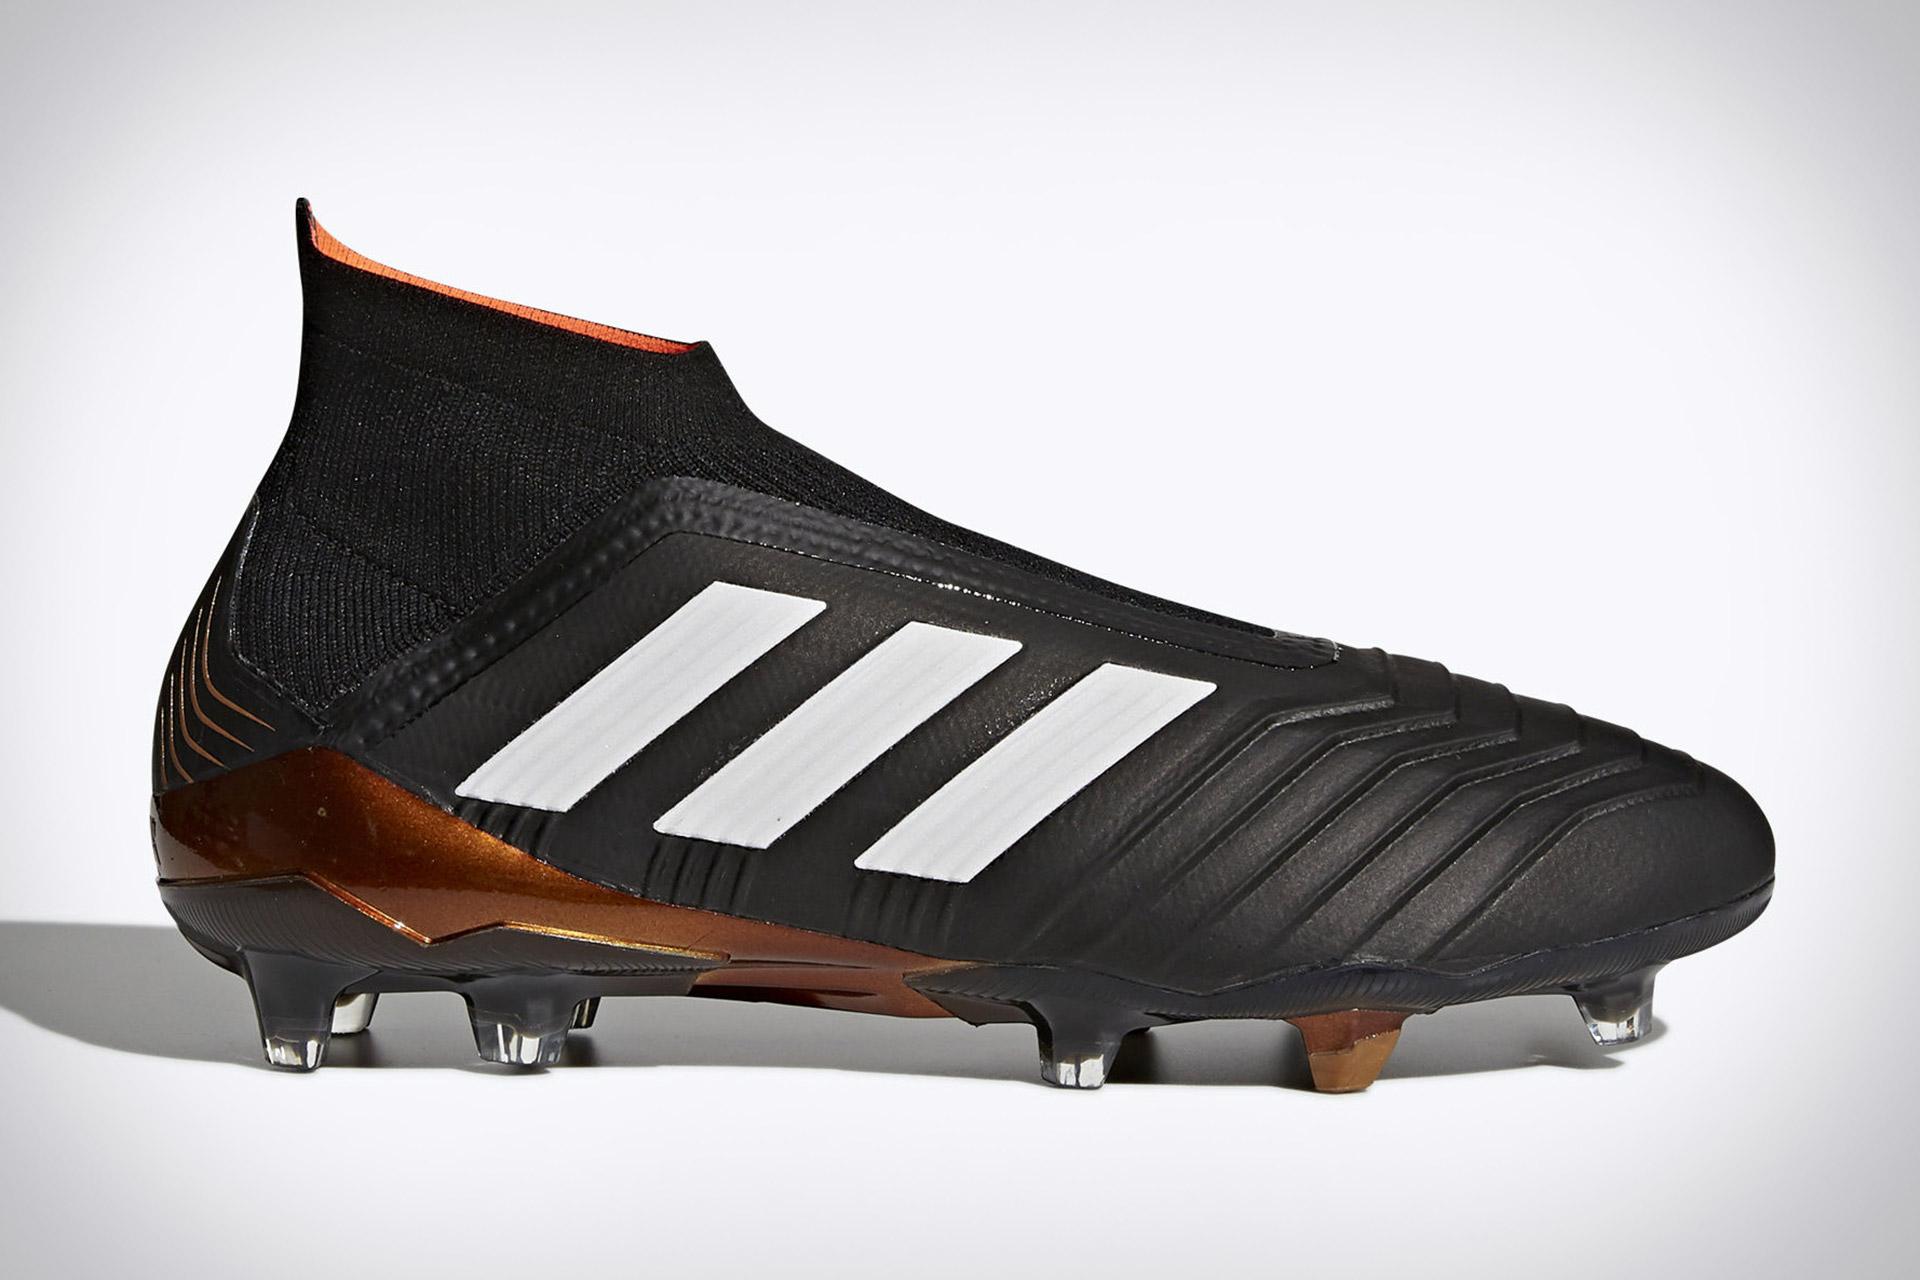 Adidas Predator 18+ Soccer Cleat